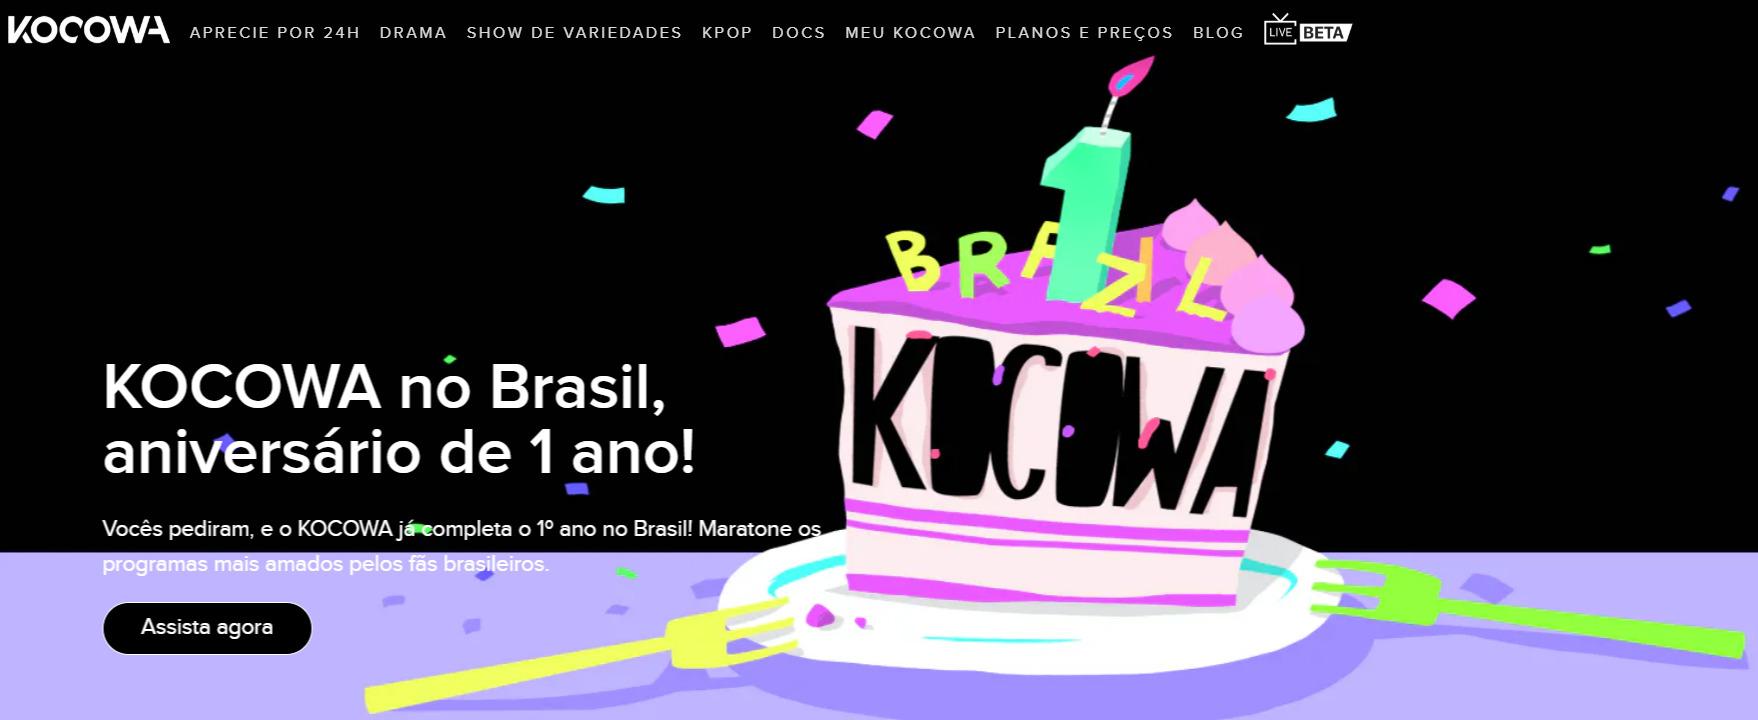 kocowa-no-brasil